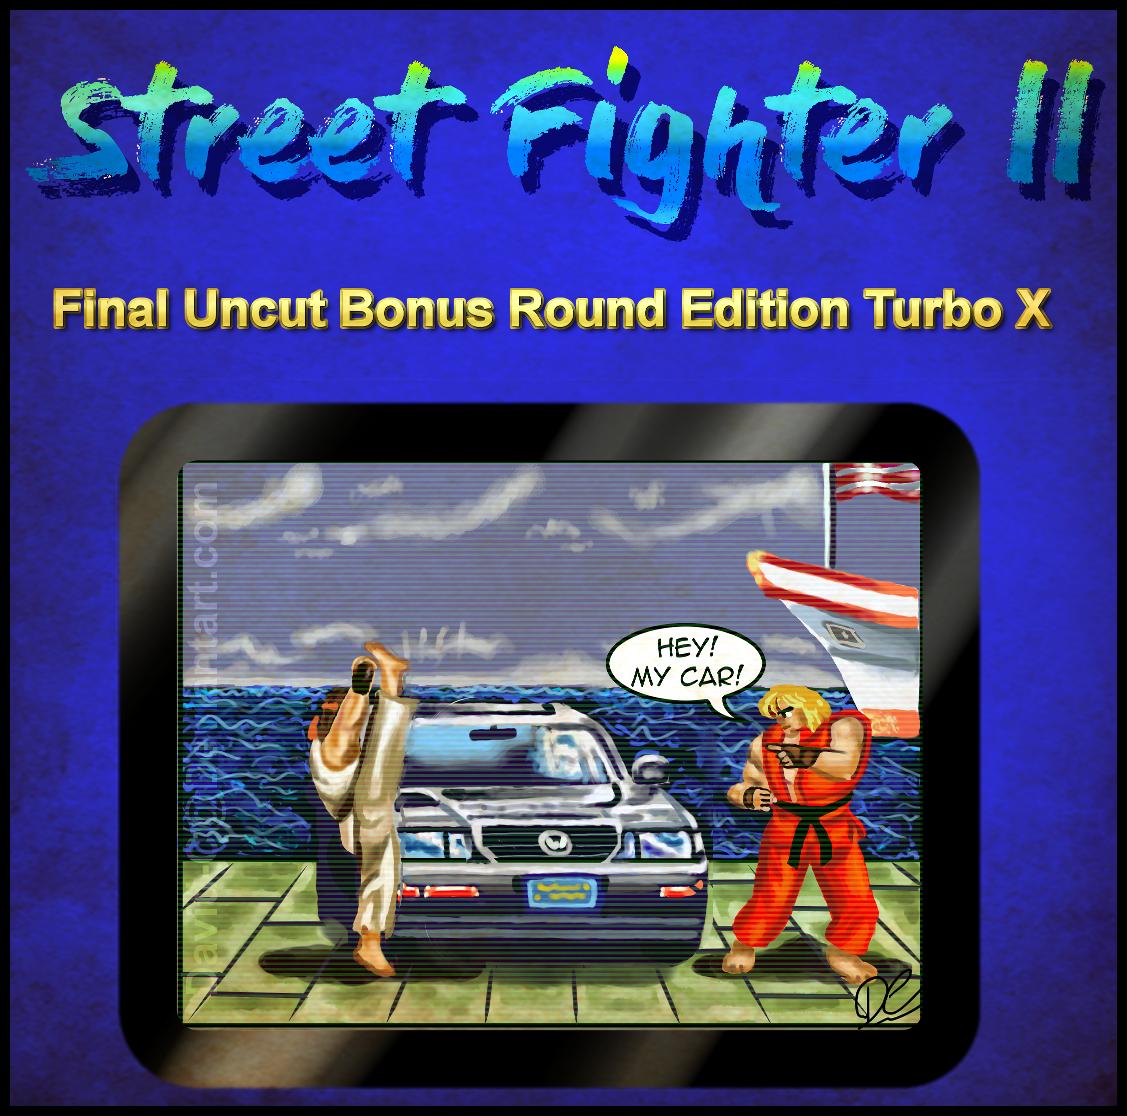 street fighter 2 final uncut bonus round edition by david c2011 on deviantart. Black Bedroom Furniture Sets. Home Design Ideas